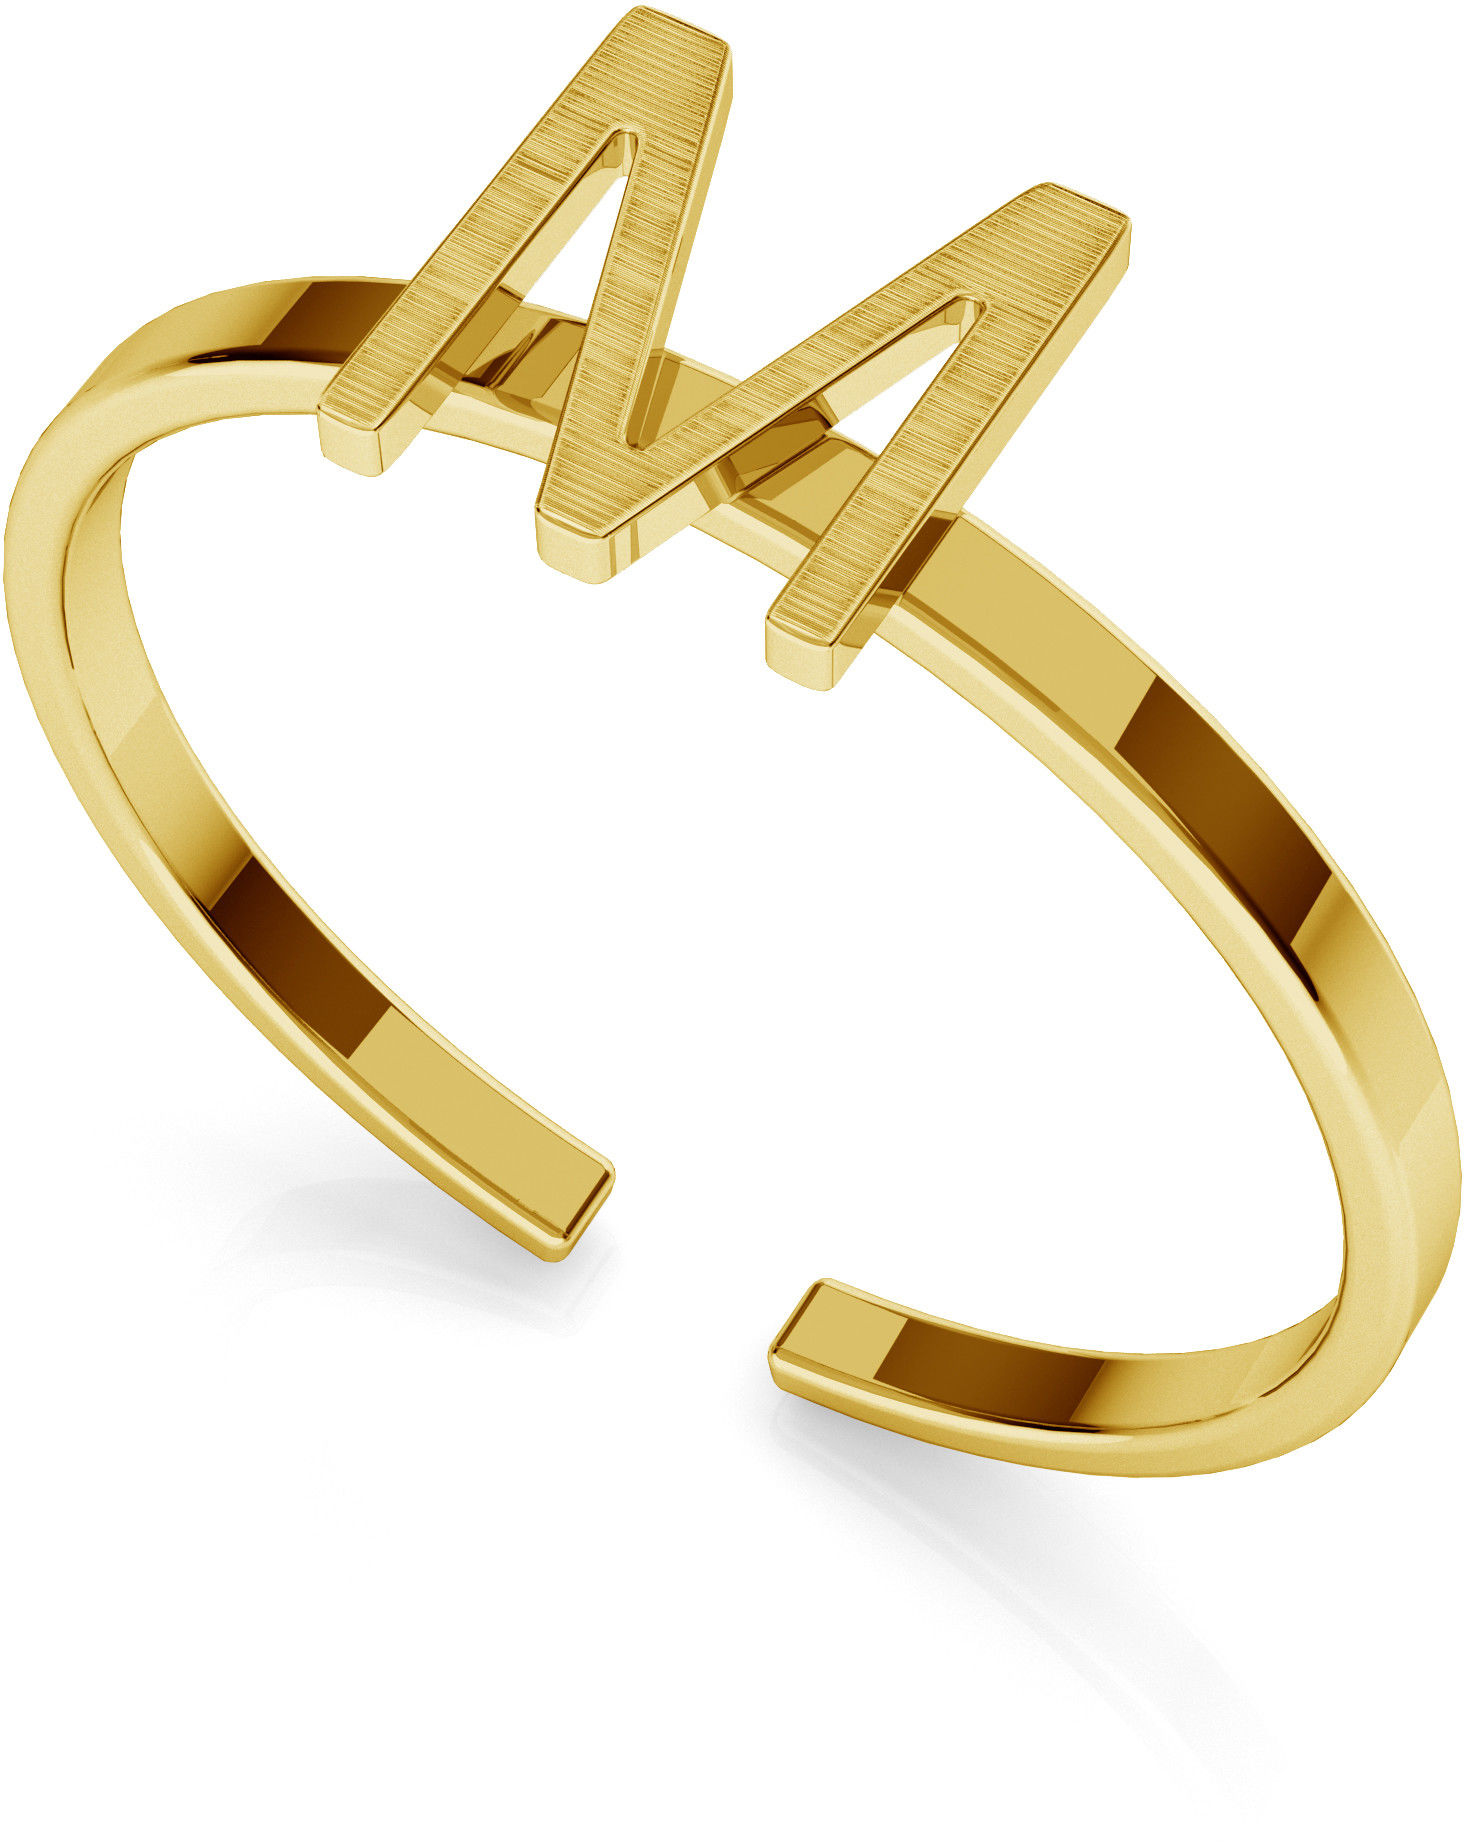 Srebrny pierścionek z literką My RING, srebro 925 : Litera - P, Srebro - kolor pokrycia - Pokrycie żółtym 18K złotem